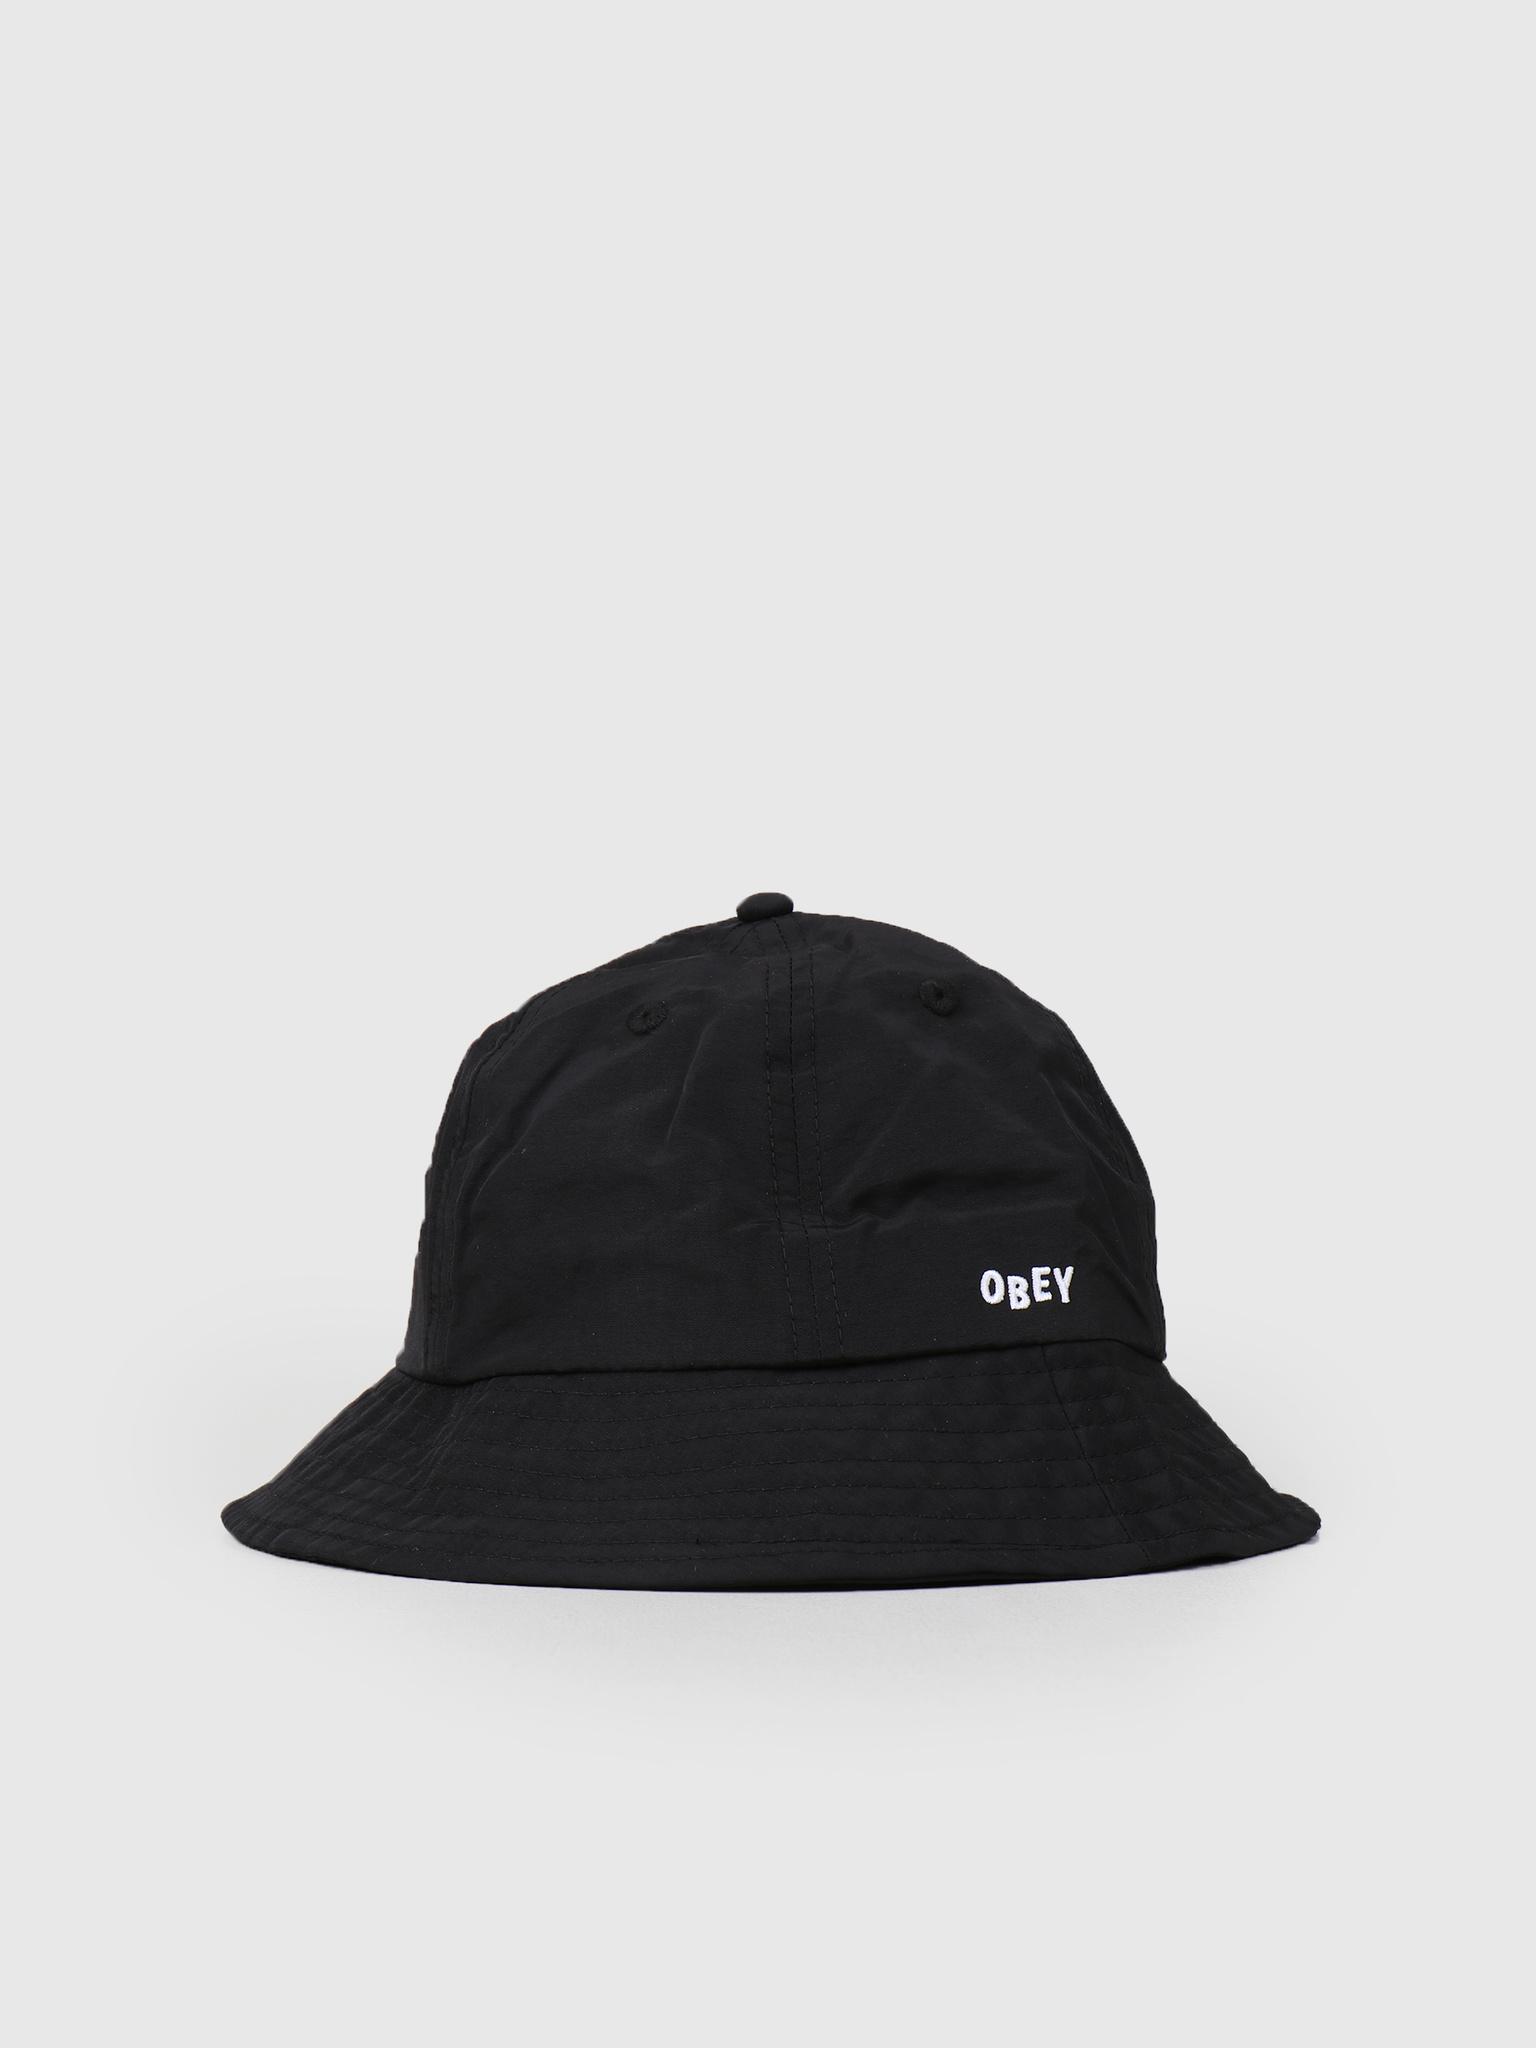 Obey Obey Frederick Bucket Hat BLK 100520019